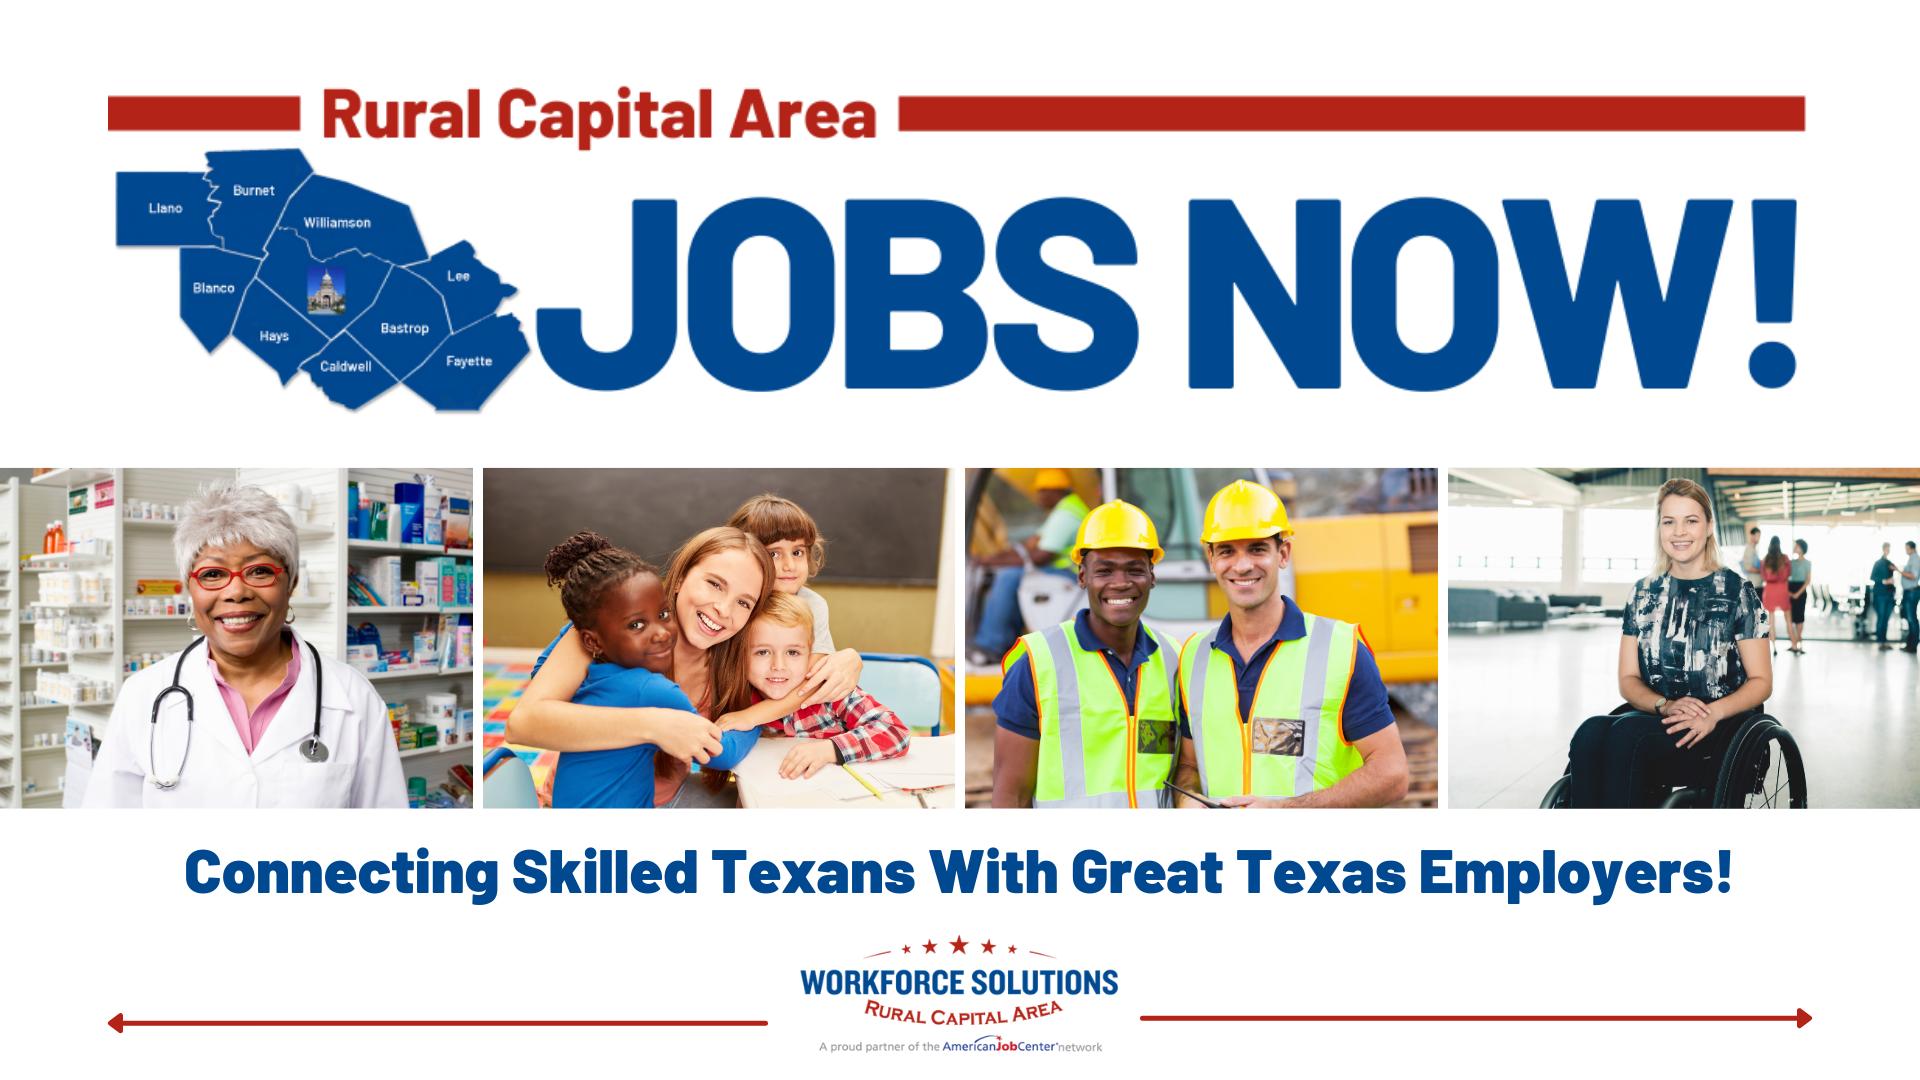 Rural Capital Area Jobs Now